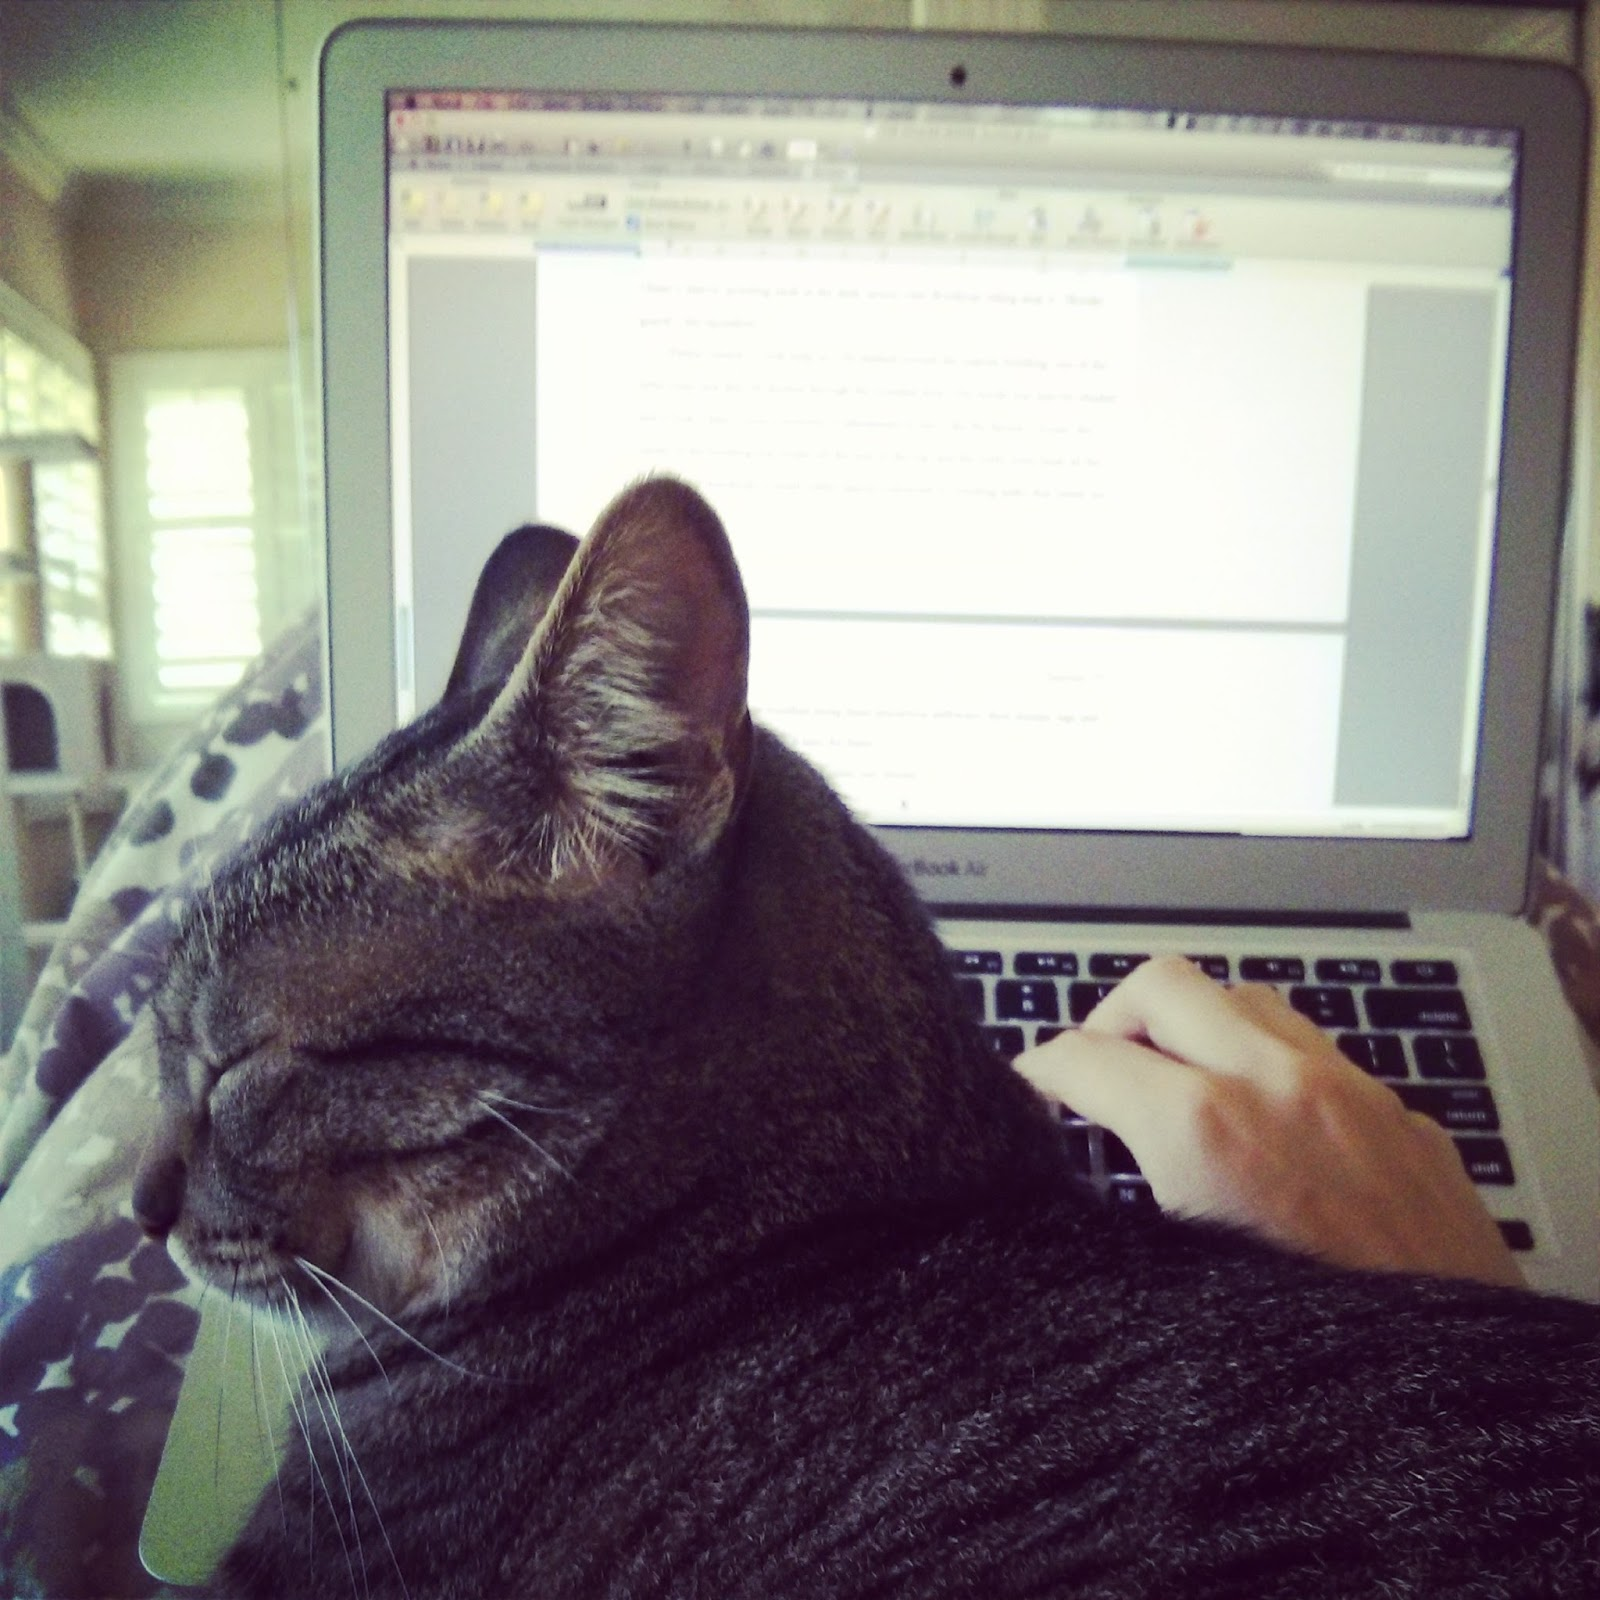 NOW AVAILABLE FOR DOWNLOAD see description  MEME REMIXES  Yass Cat House Mix